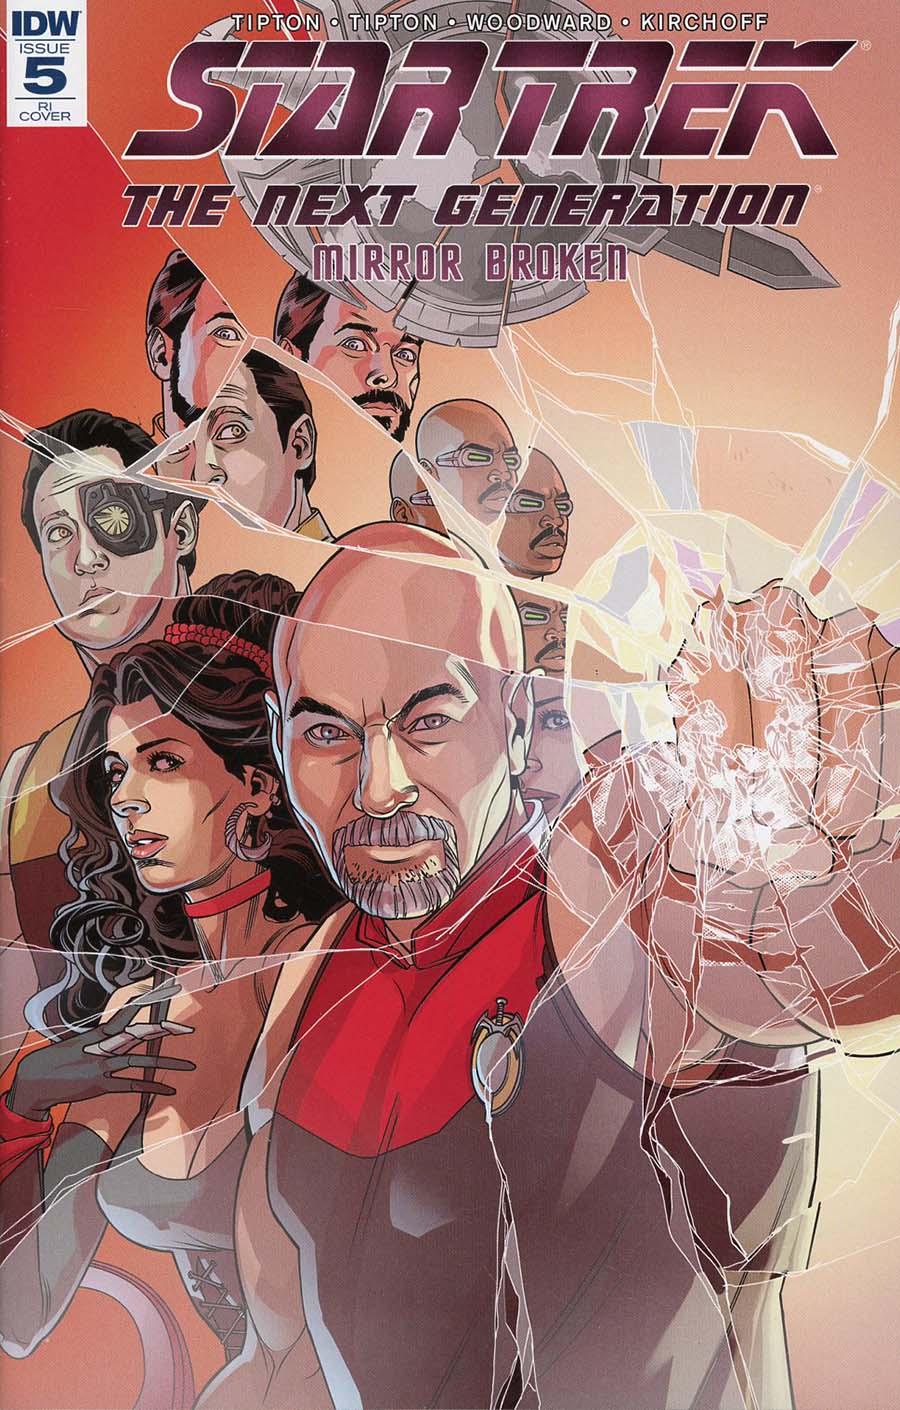 Star Trek The Next Generation Mirror Broken #5 Cover C Incentive Rachael Stott Variant Cover